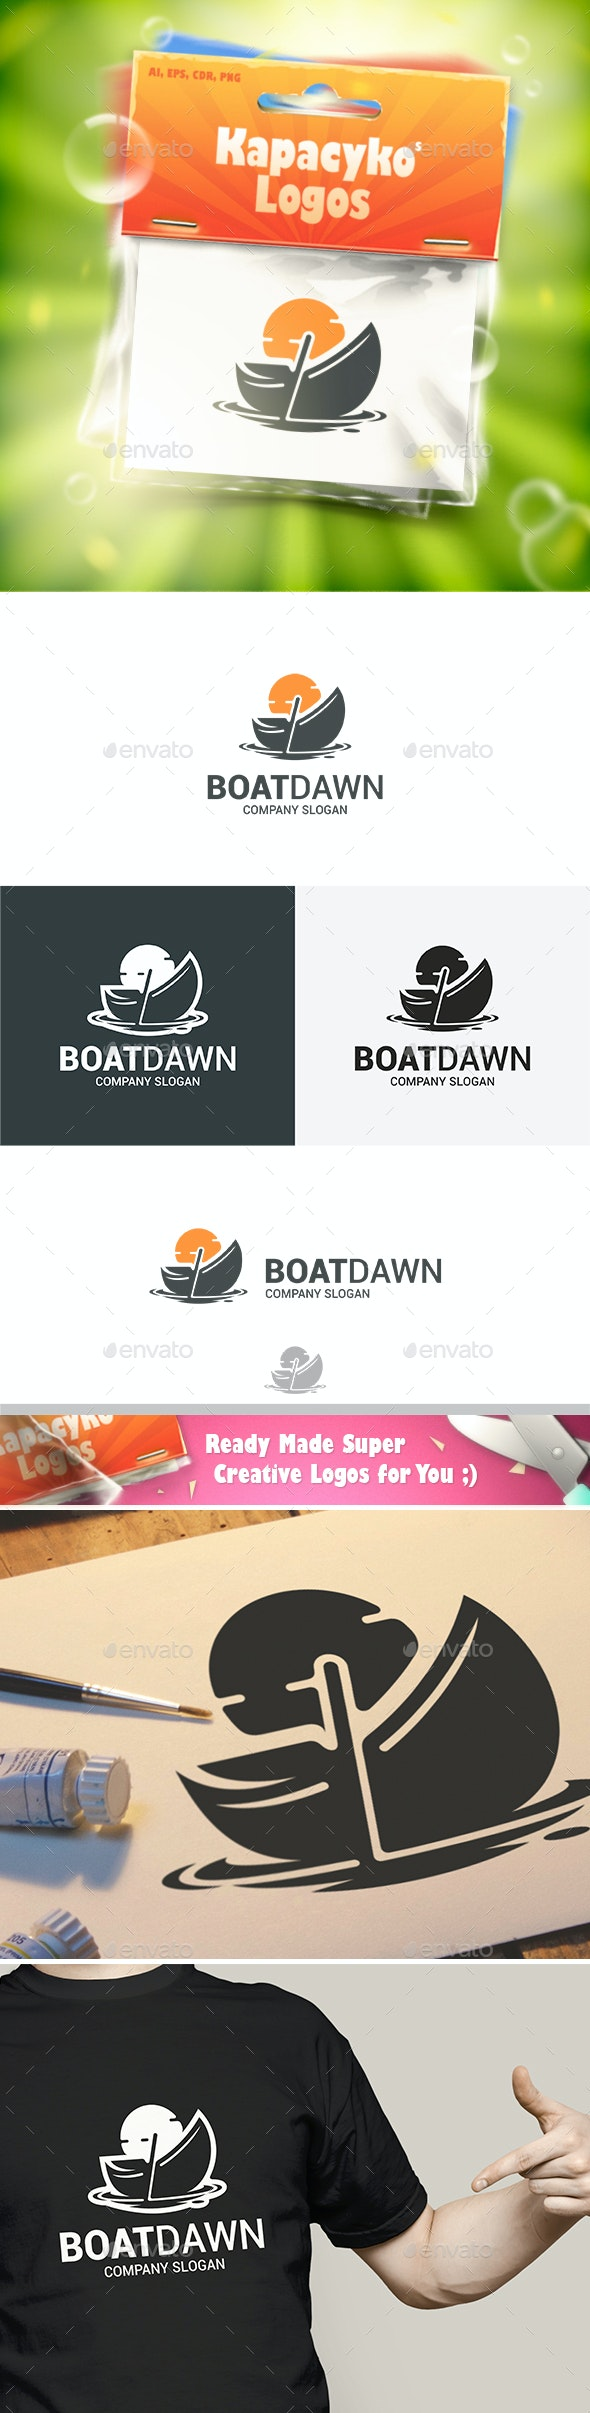 Boat Dawn Logo - Abstract Logo Templates